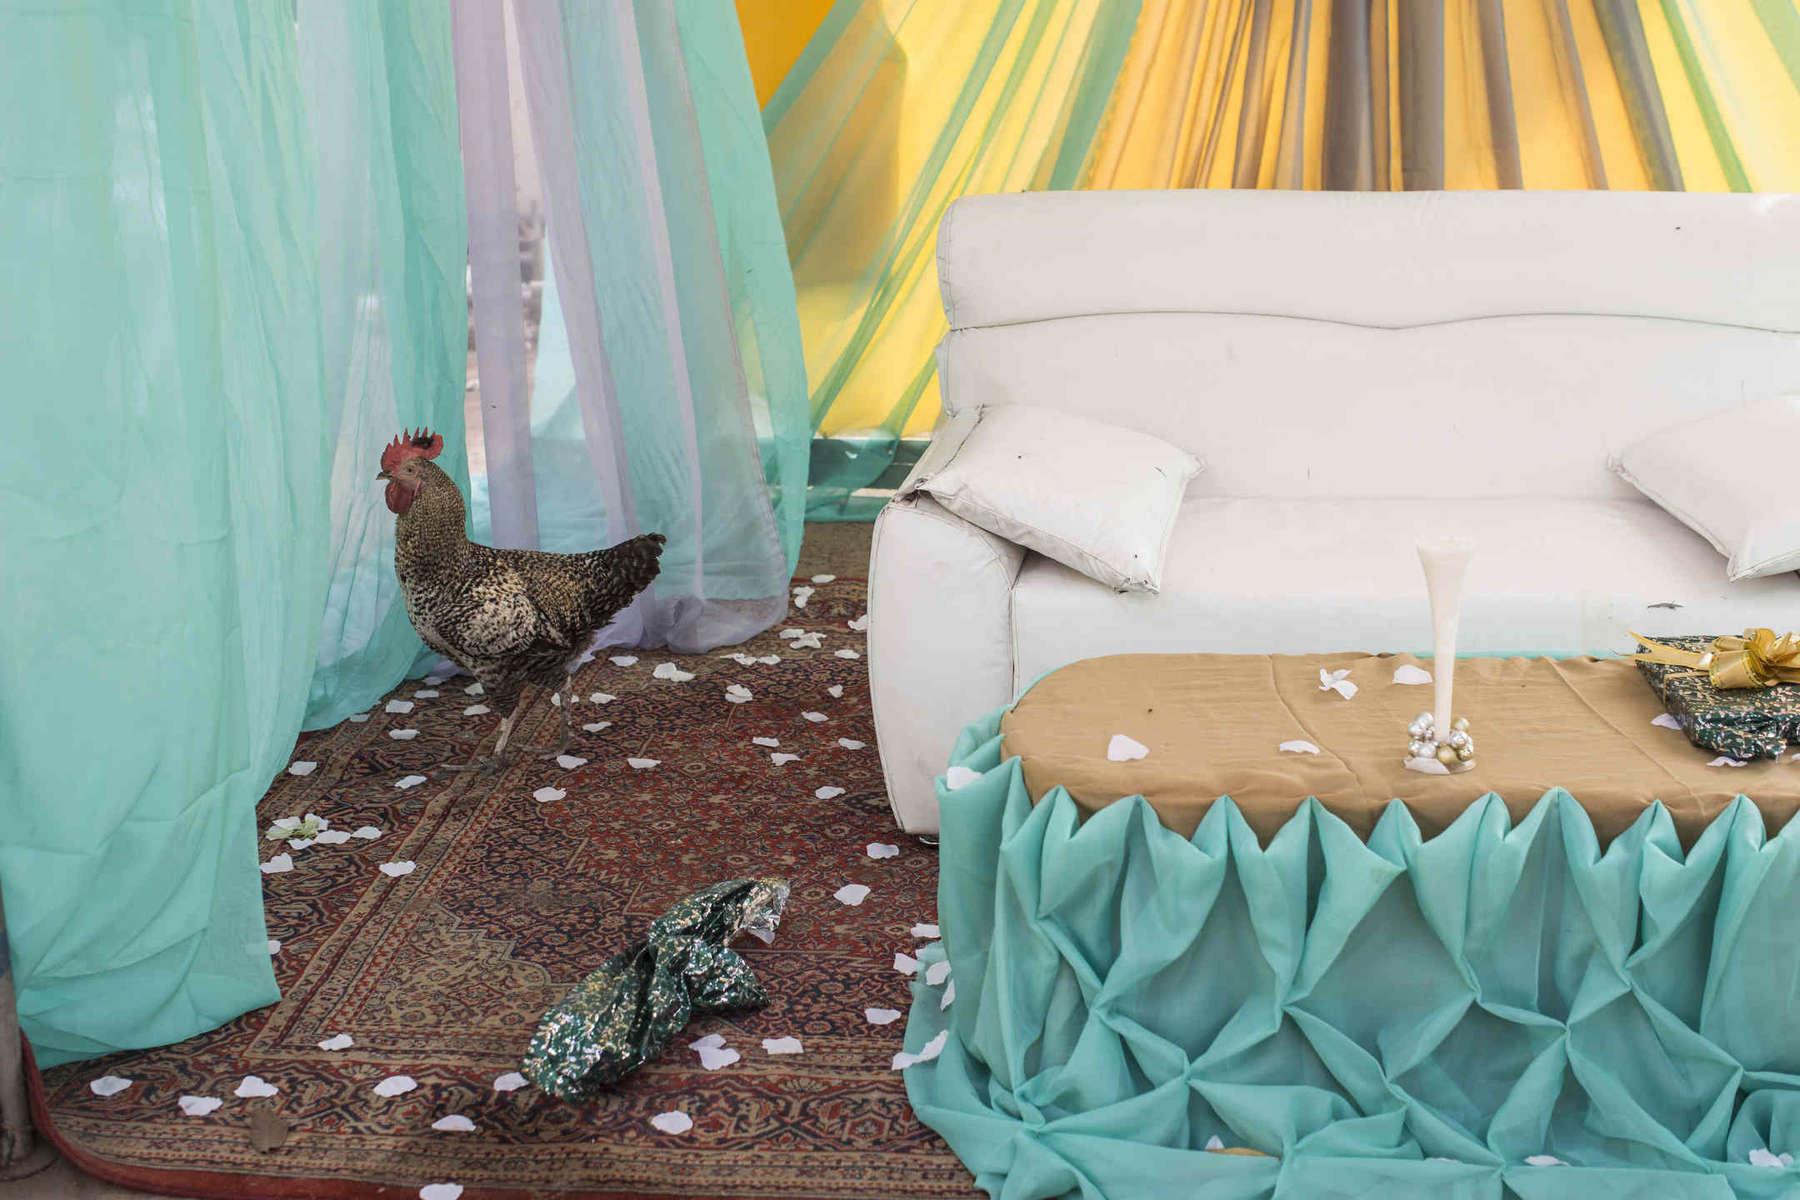 A chicken runs through the bridal tent in Yaba, a working class neighborhood in Lagos, Nigeria.